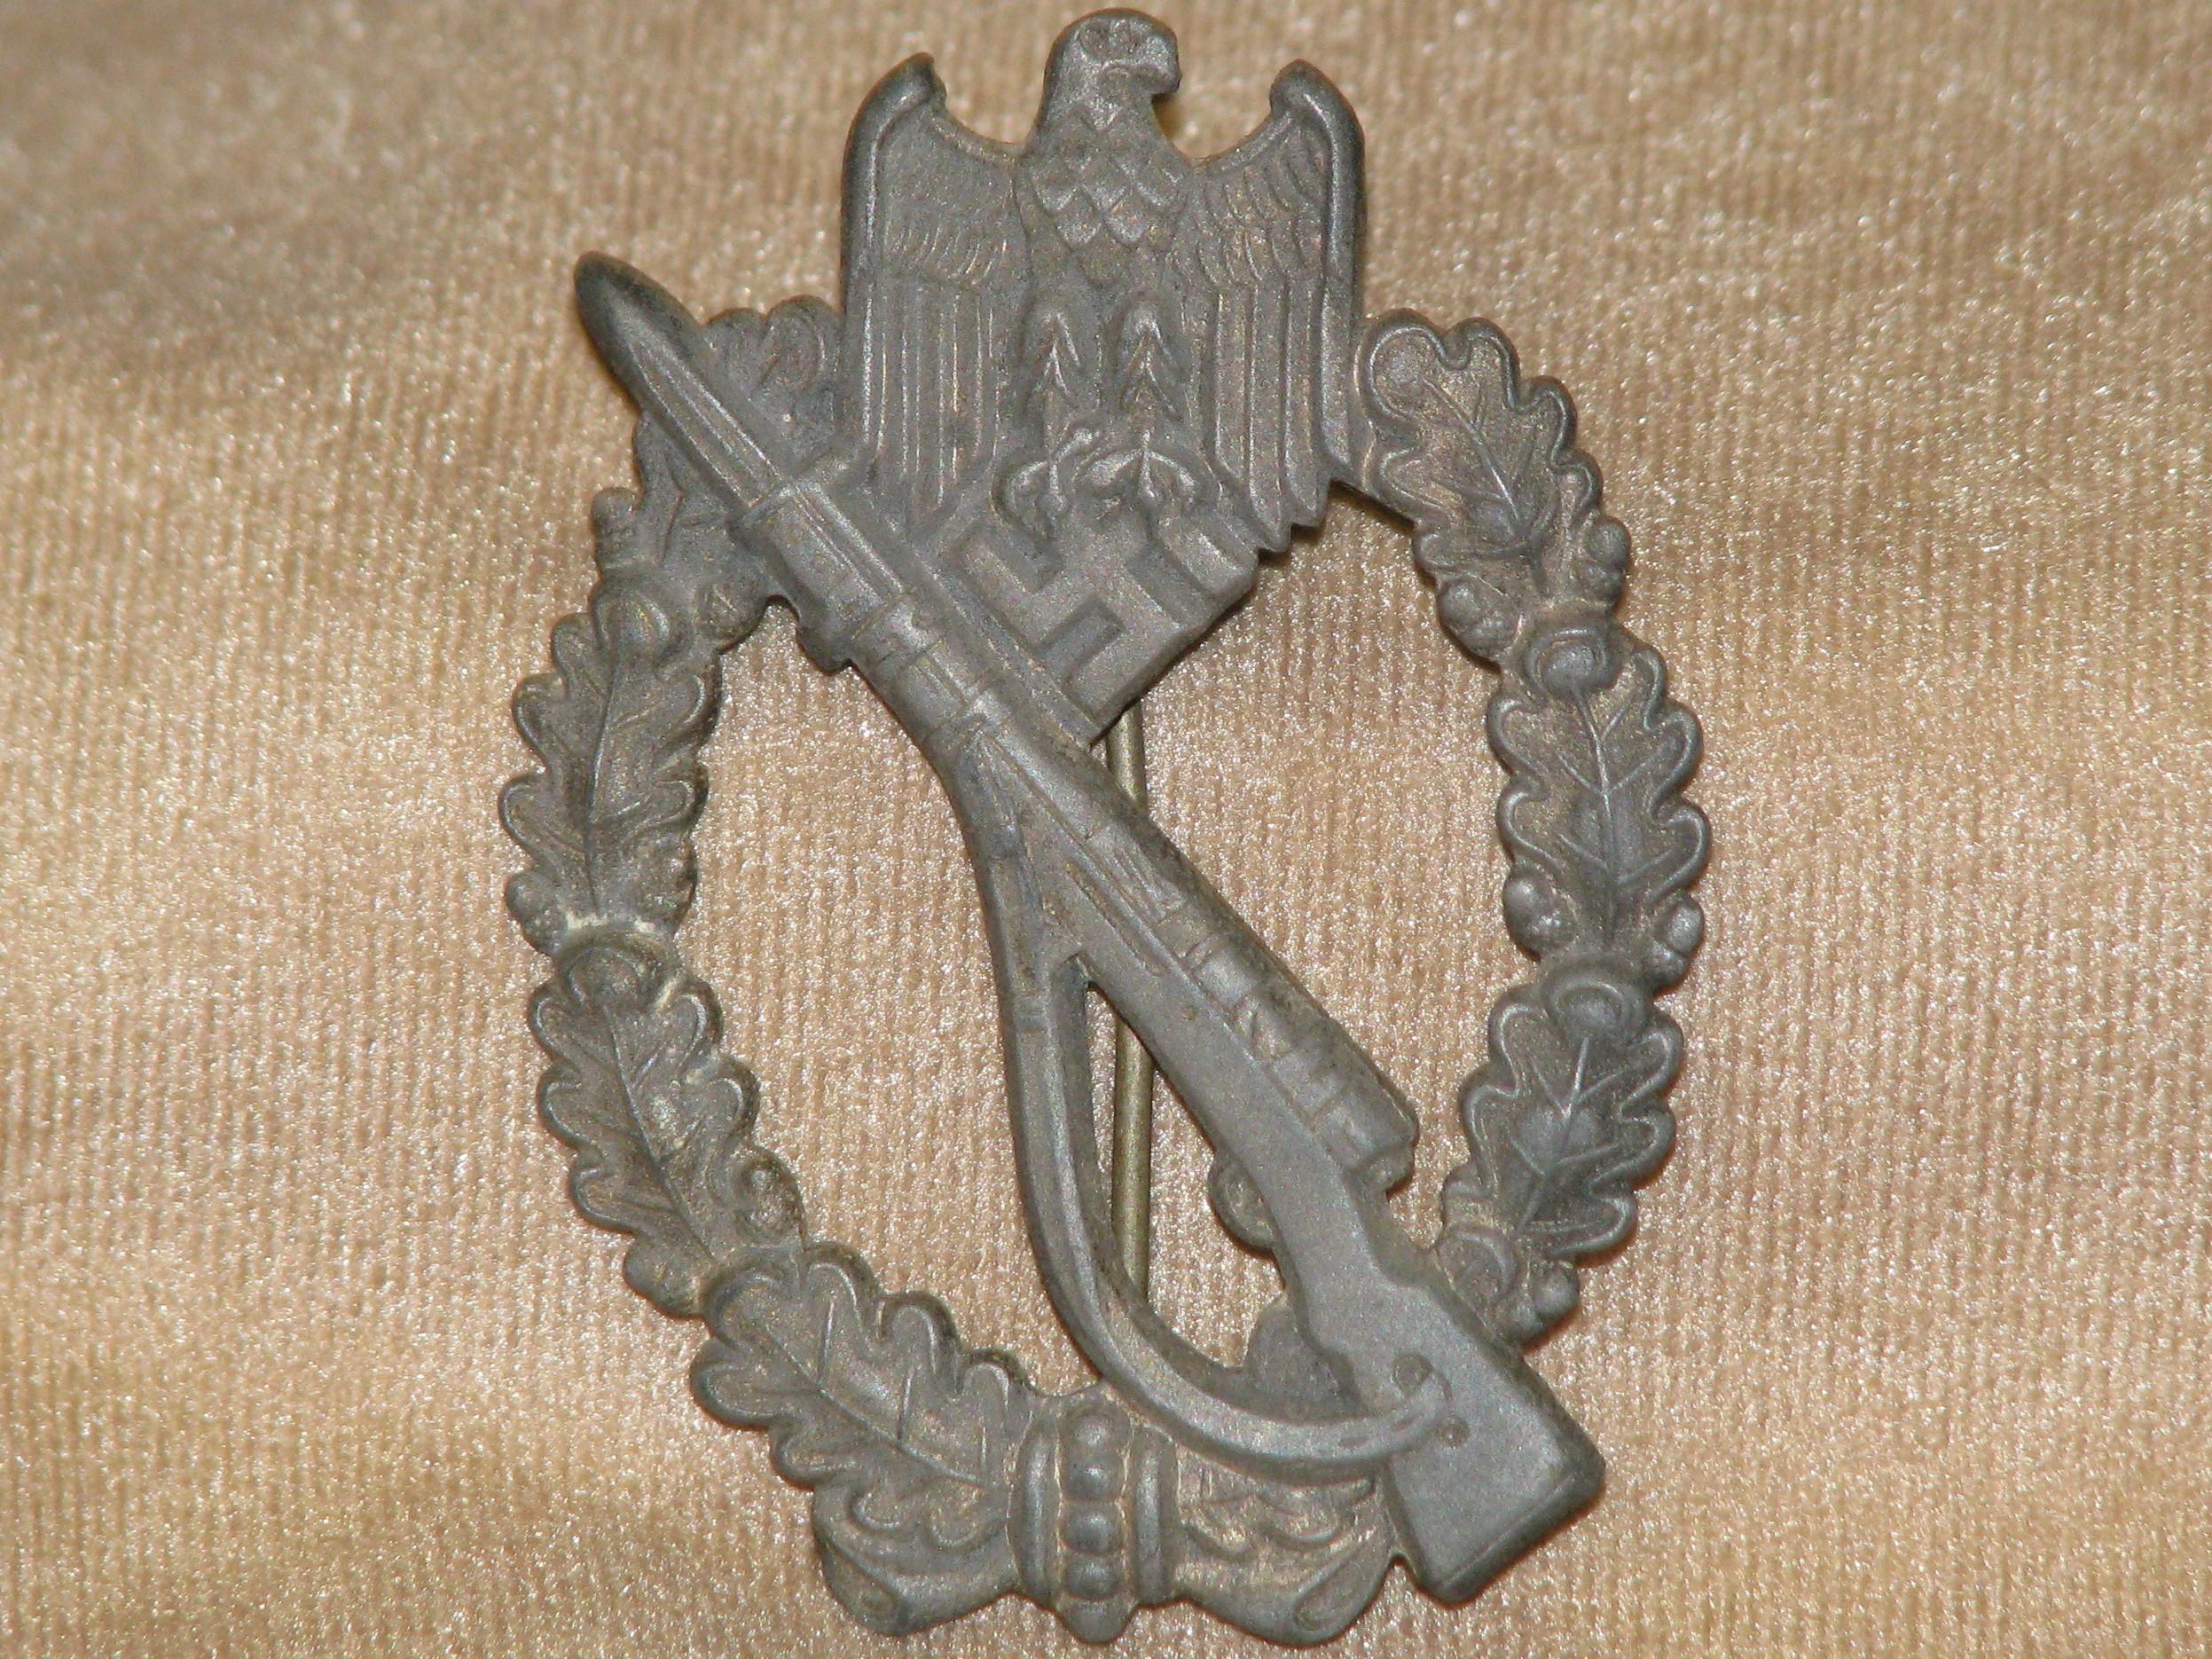 WWII German Infantry Assault Badge 18-154